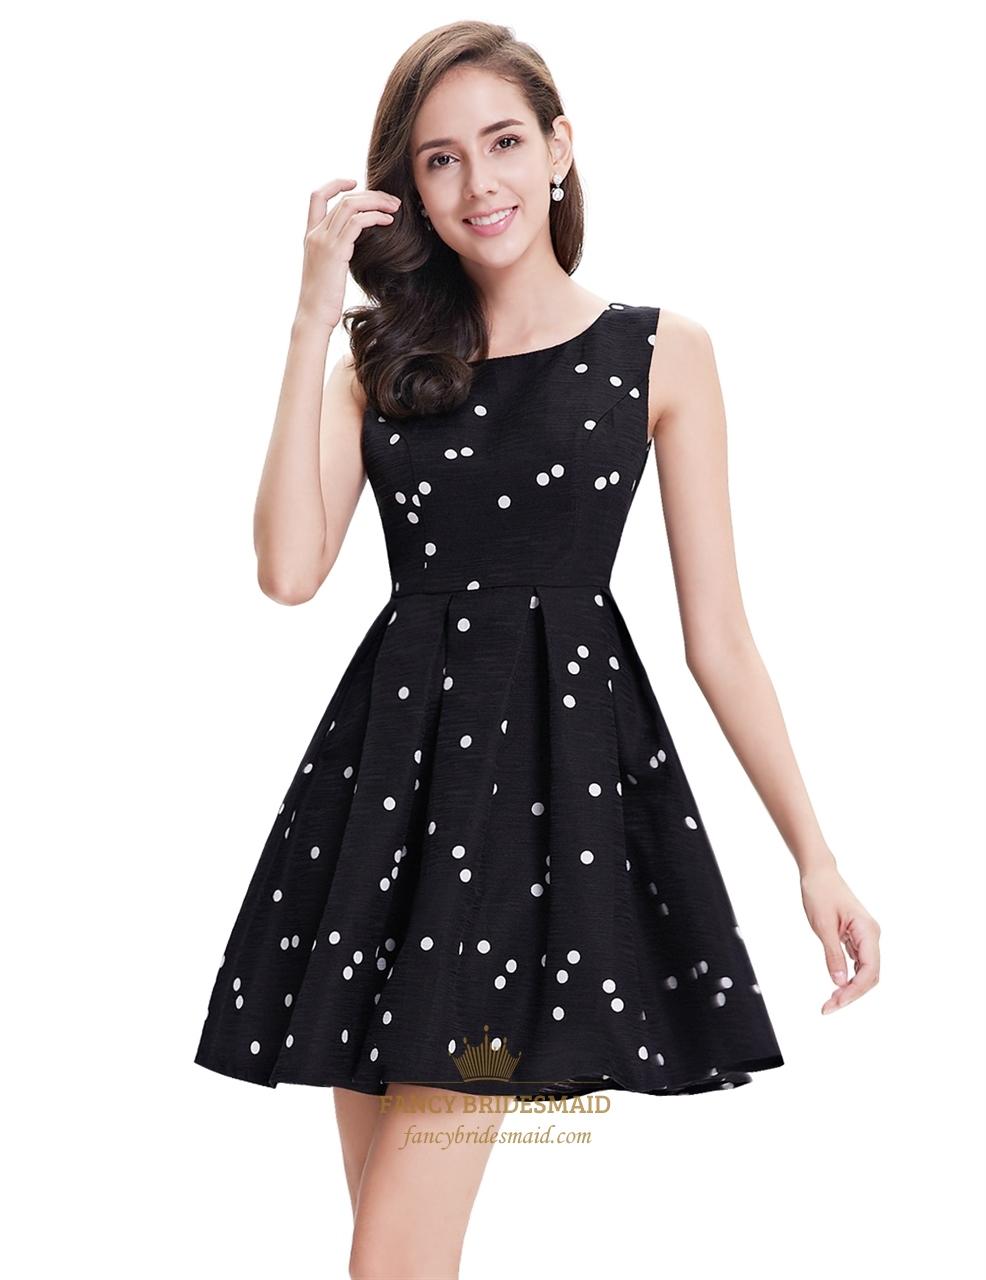 Find black and white polka dot dress from a vast selection of Elegant Dresses for Women. Get great deals on eBay!